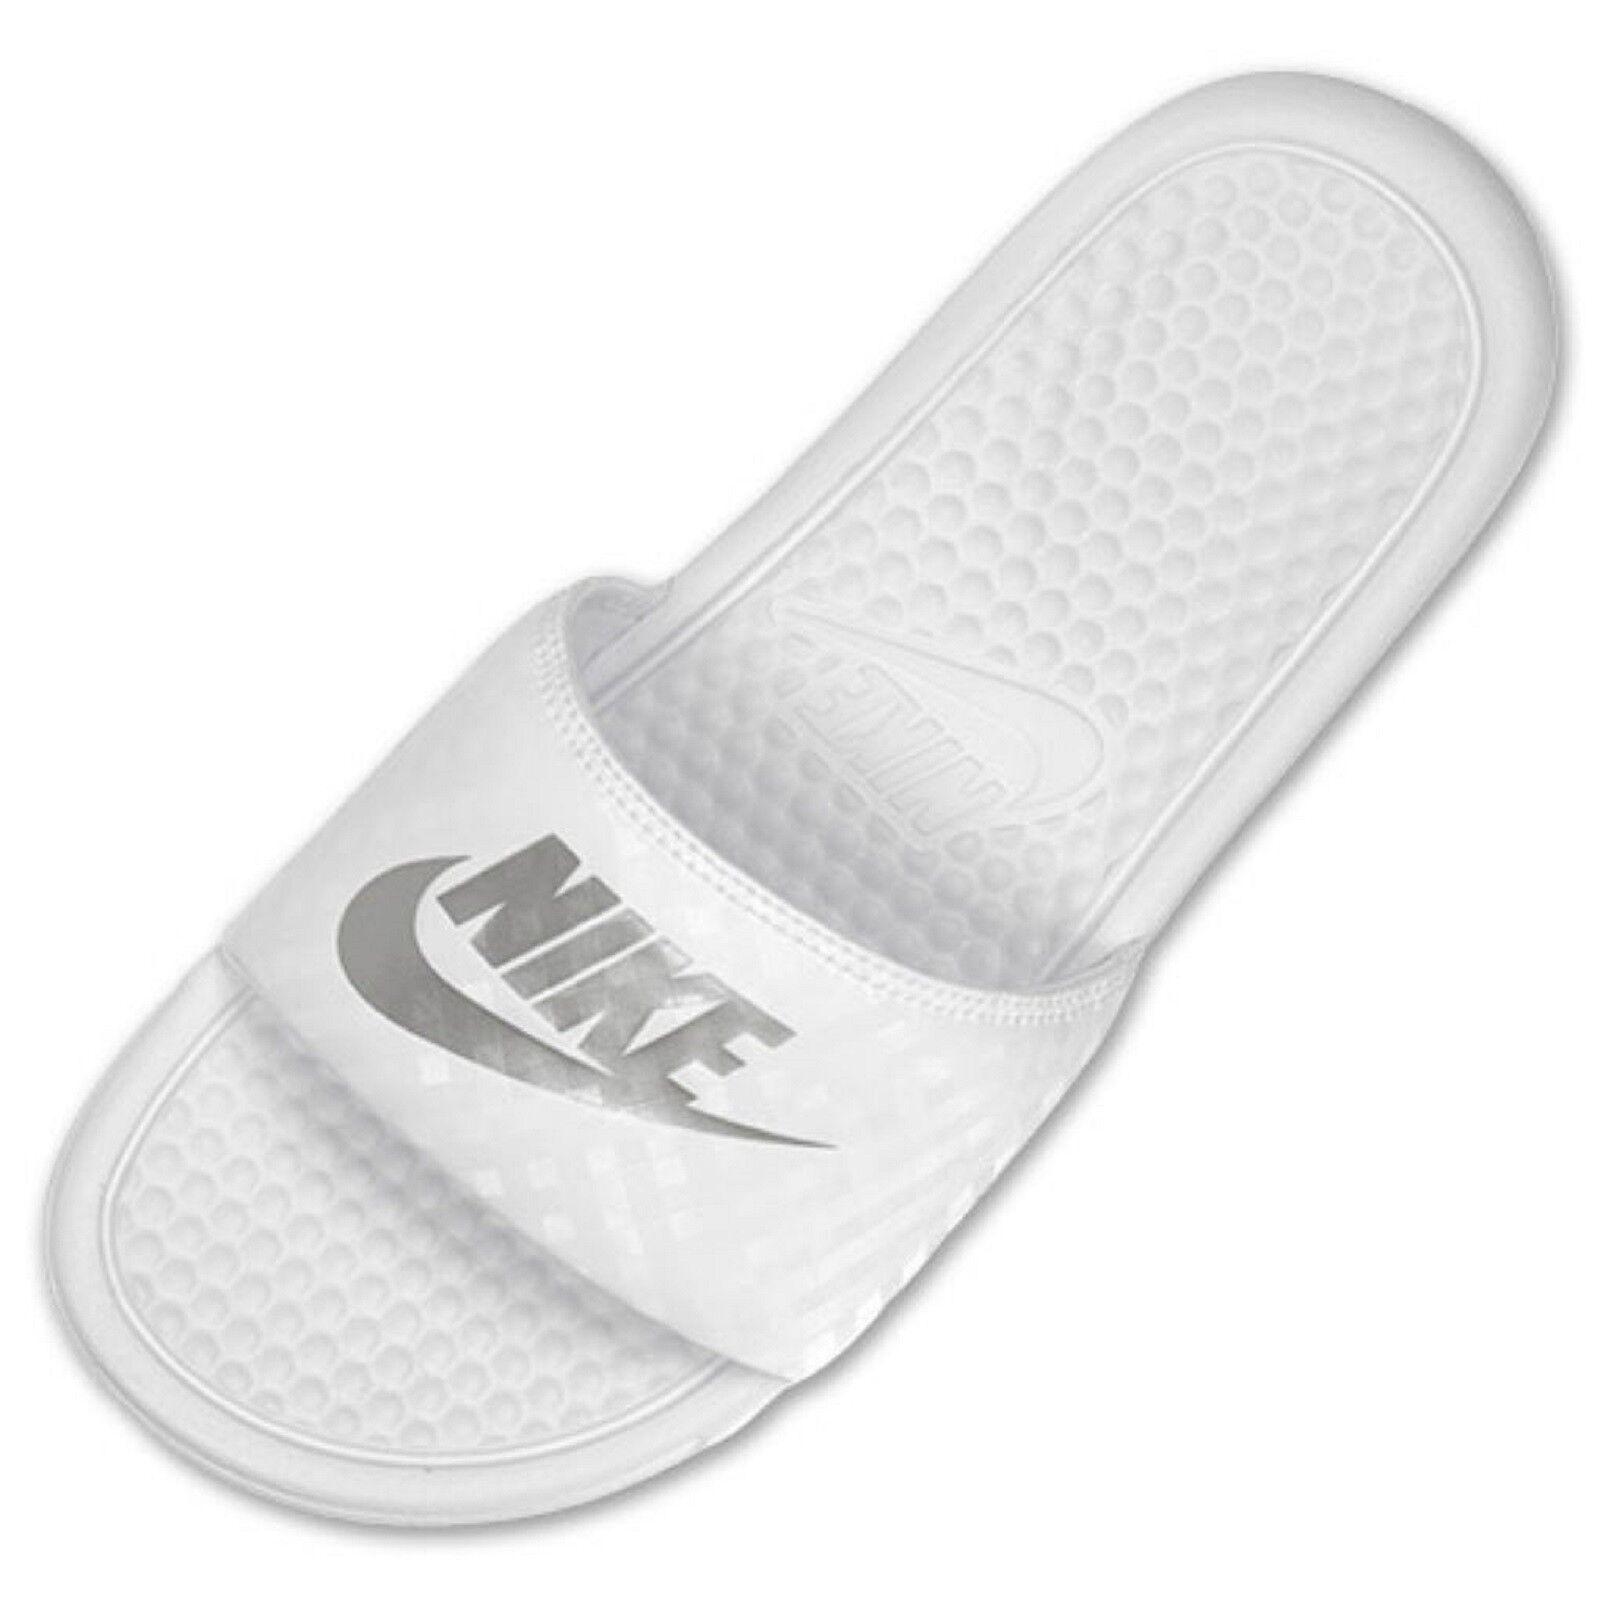 Nike Benassi JDI Swoosh Slide Sandals